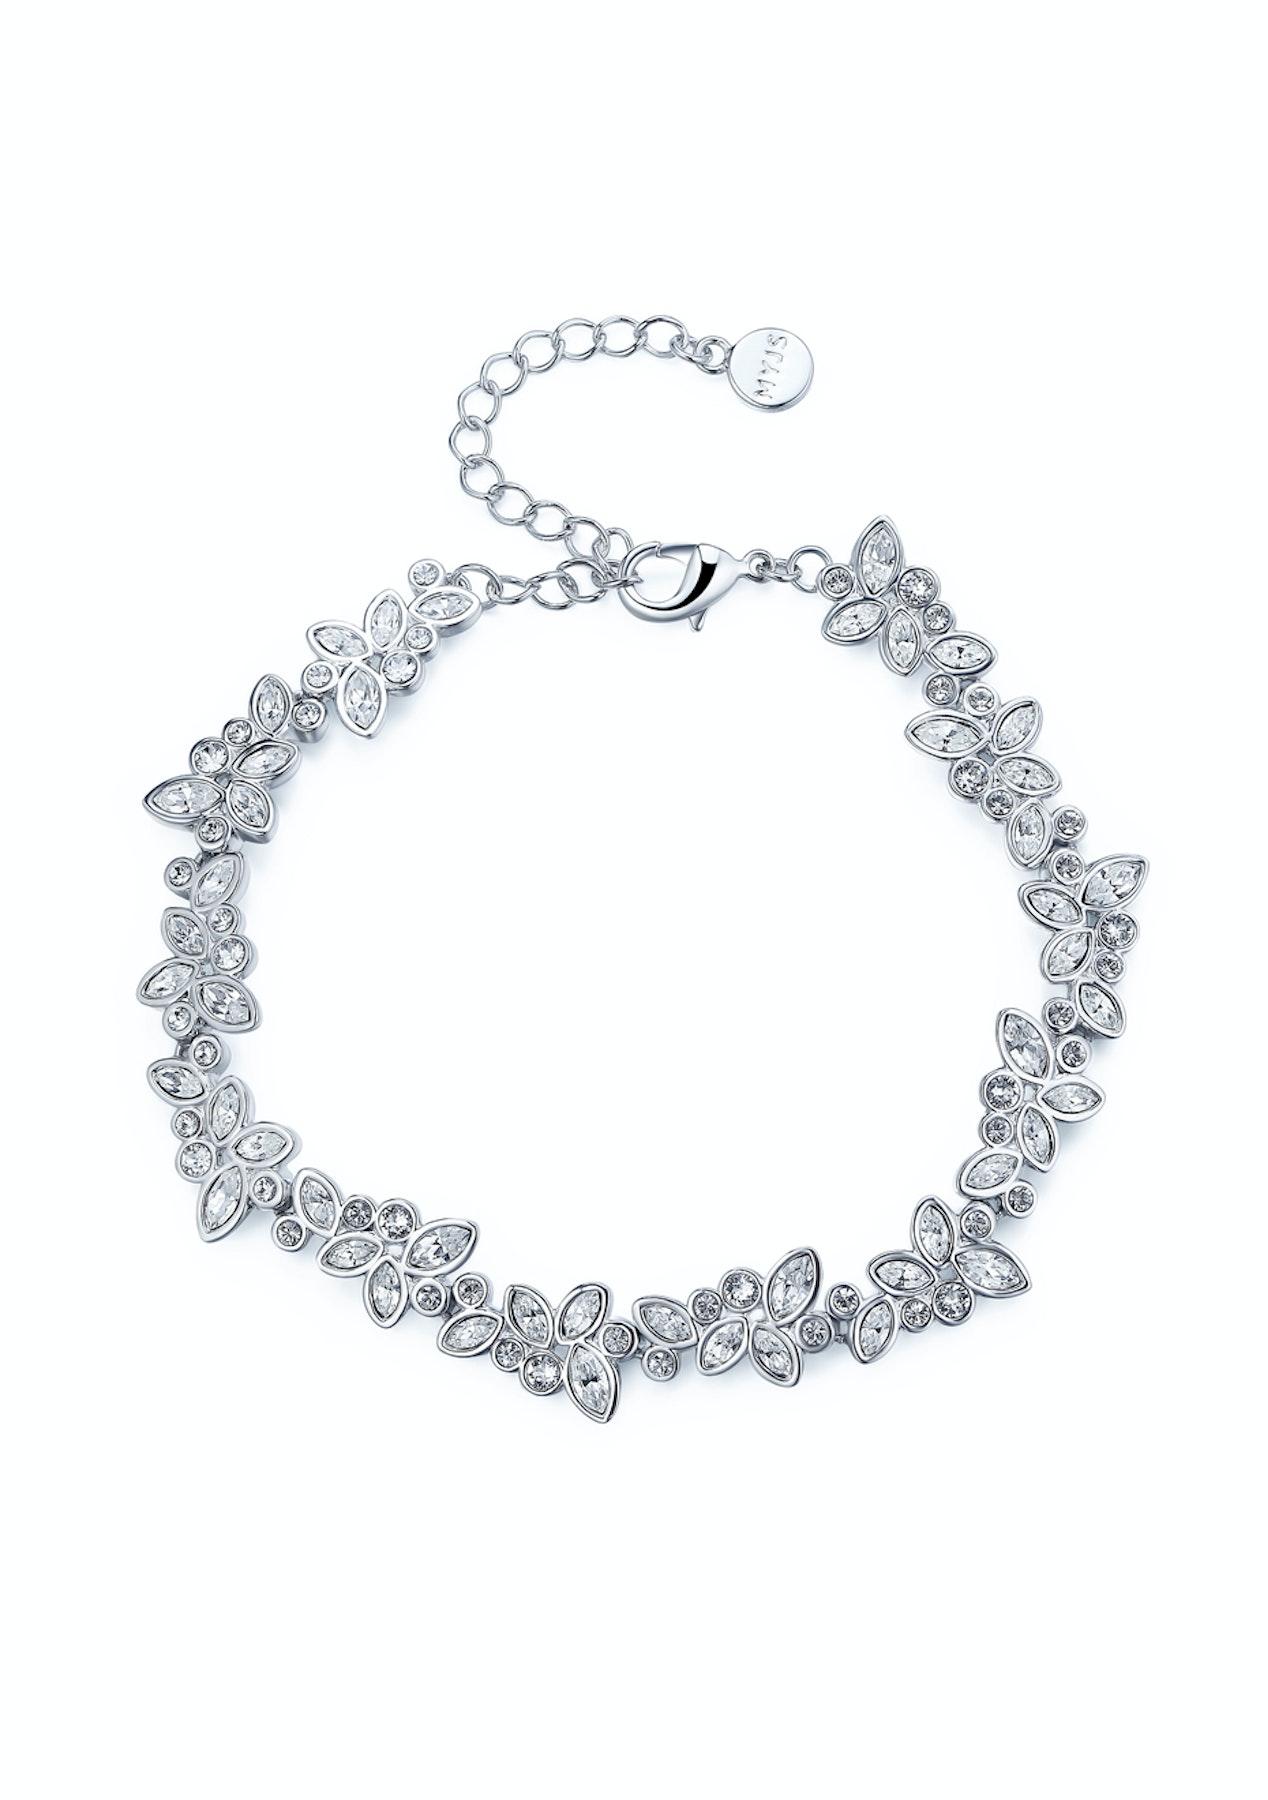 f52394d0f Krystal Cotoure - Diapason Enchanted Bracelet with Swarovski Crystals WGP  MYJS - My Jewellery Store Swarovski Elements Jewellery Under $40 - Onceit